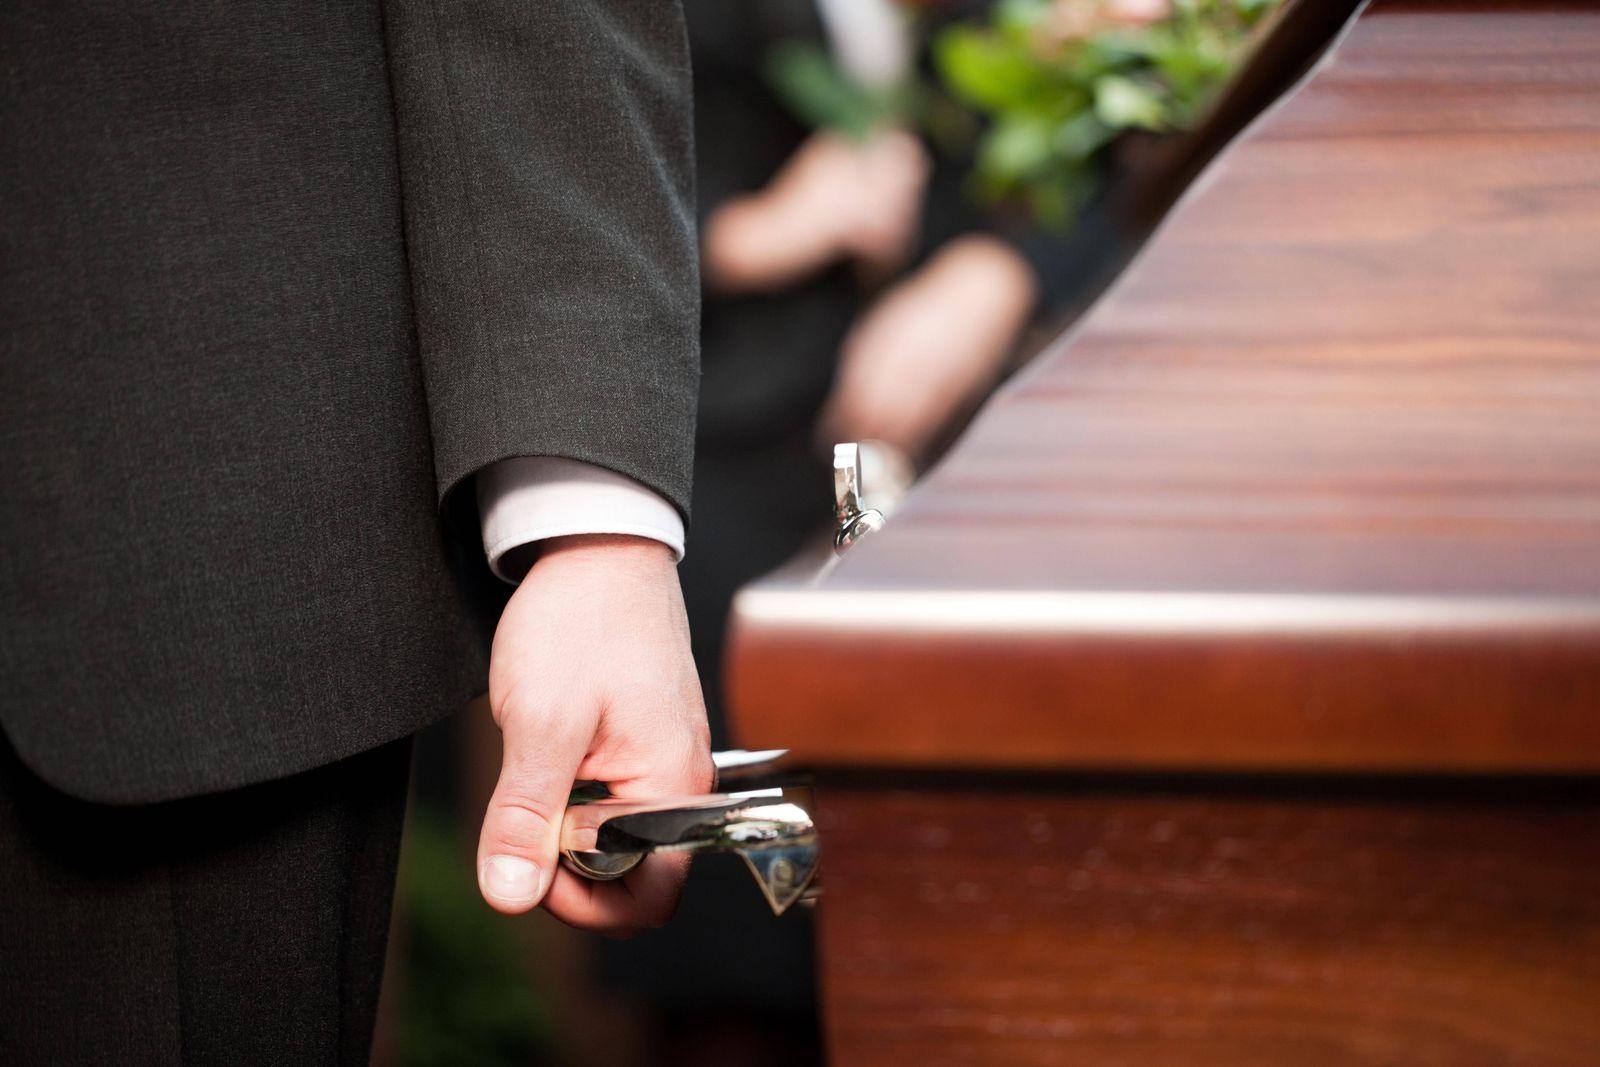 funeral with coffin PUBLICATIONxINxGERxSUIxAUTxONLY Copyright xKzenonx Panthermedia06254569